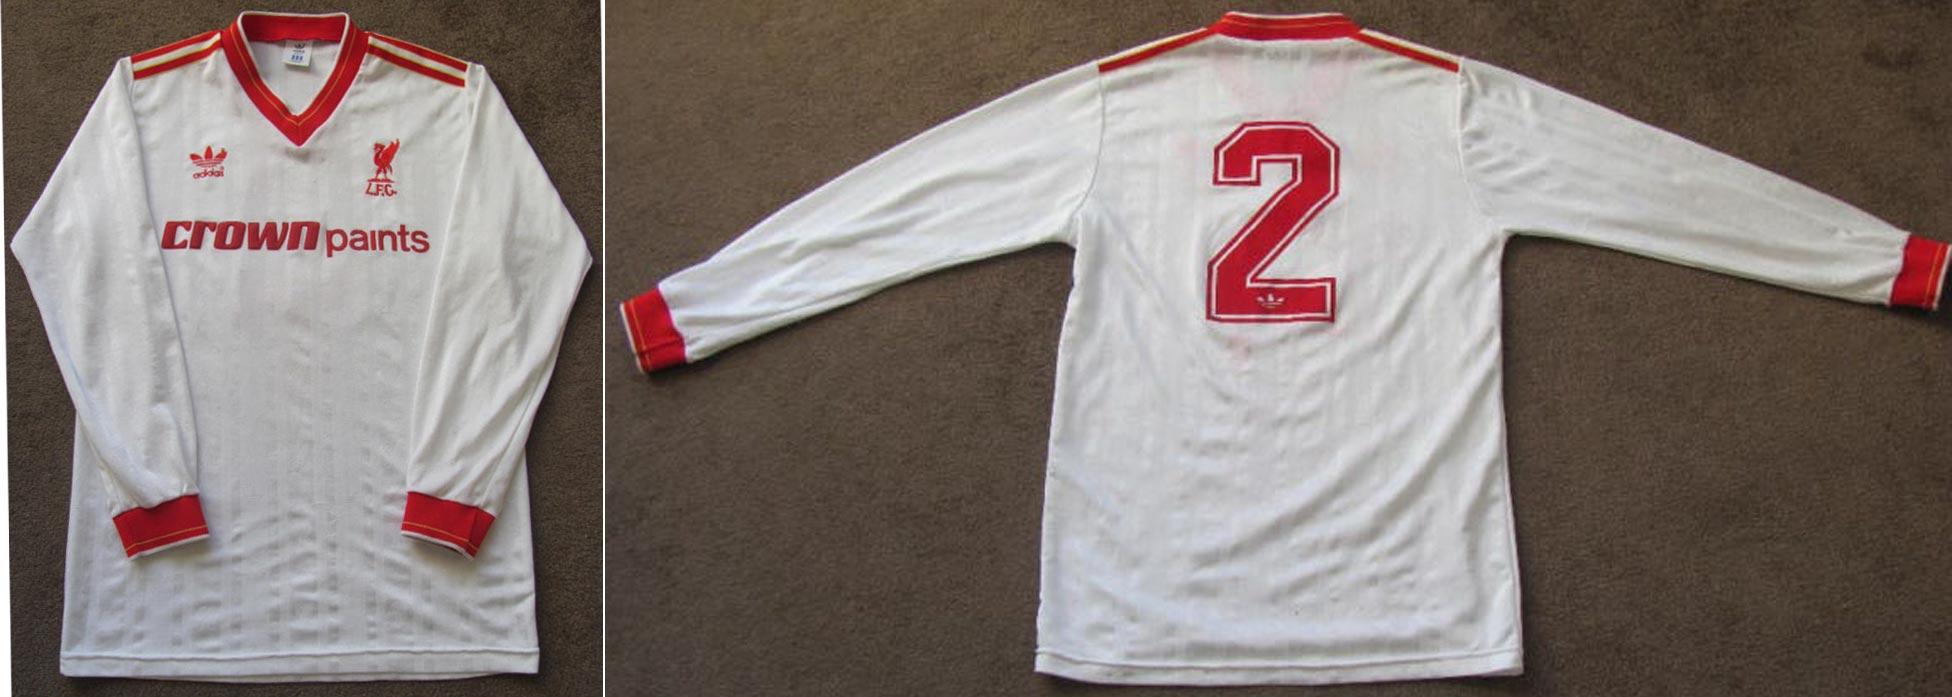 22afadb6a 1985-86 Away player shirt long sleeve № 2 Phil Neal (CROWN PAINTS logo one  line) -